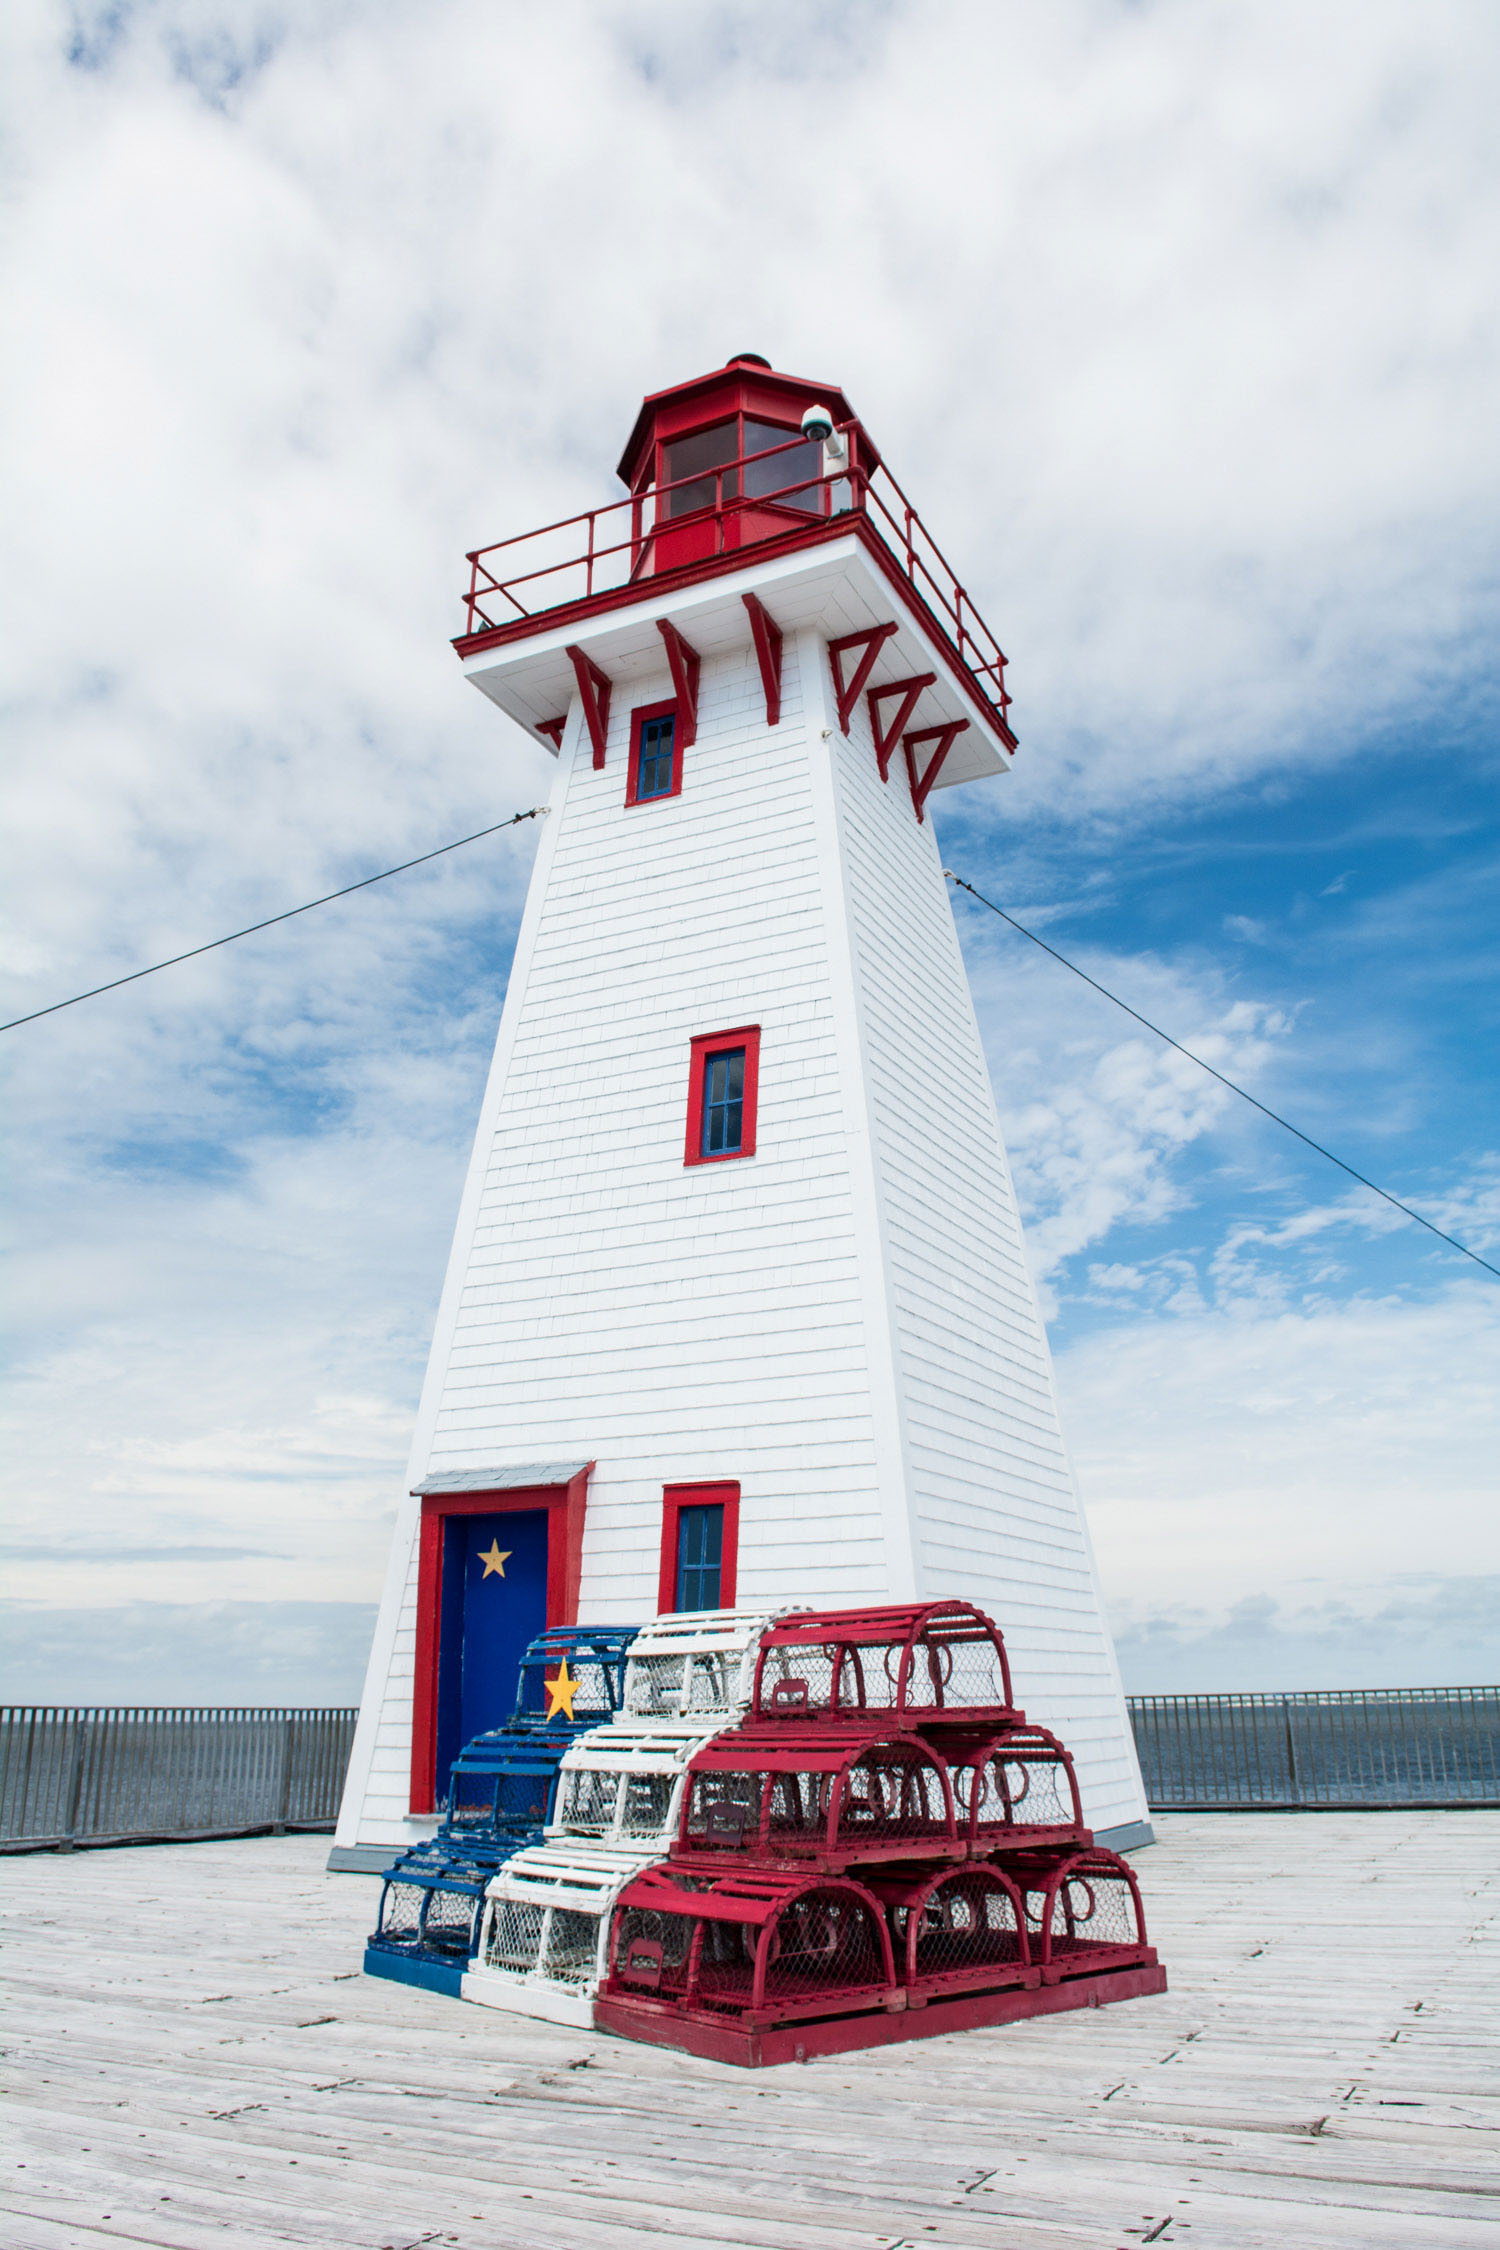 aug10-15 2014-Tourism New Brunswick-T4G Kick-summer 2014-Miramichi-Bathurst-Caraquet-Shippagan-Miscou Island-NB-web res jpg-photo by Aaron McKenzie Fraser-www.amfraser.com_AMF8579.jpg